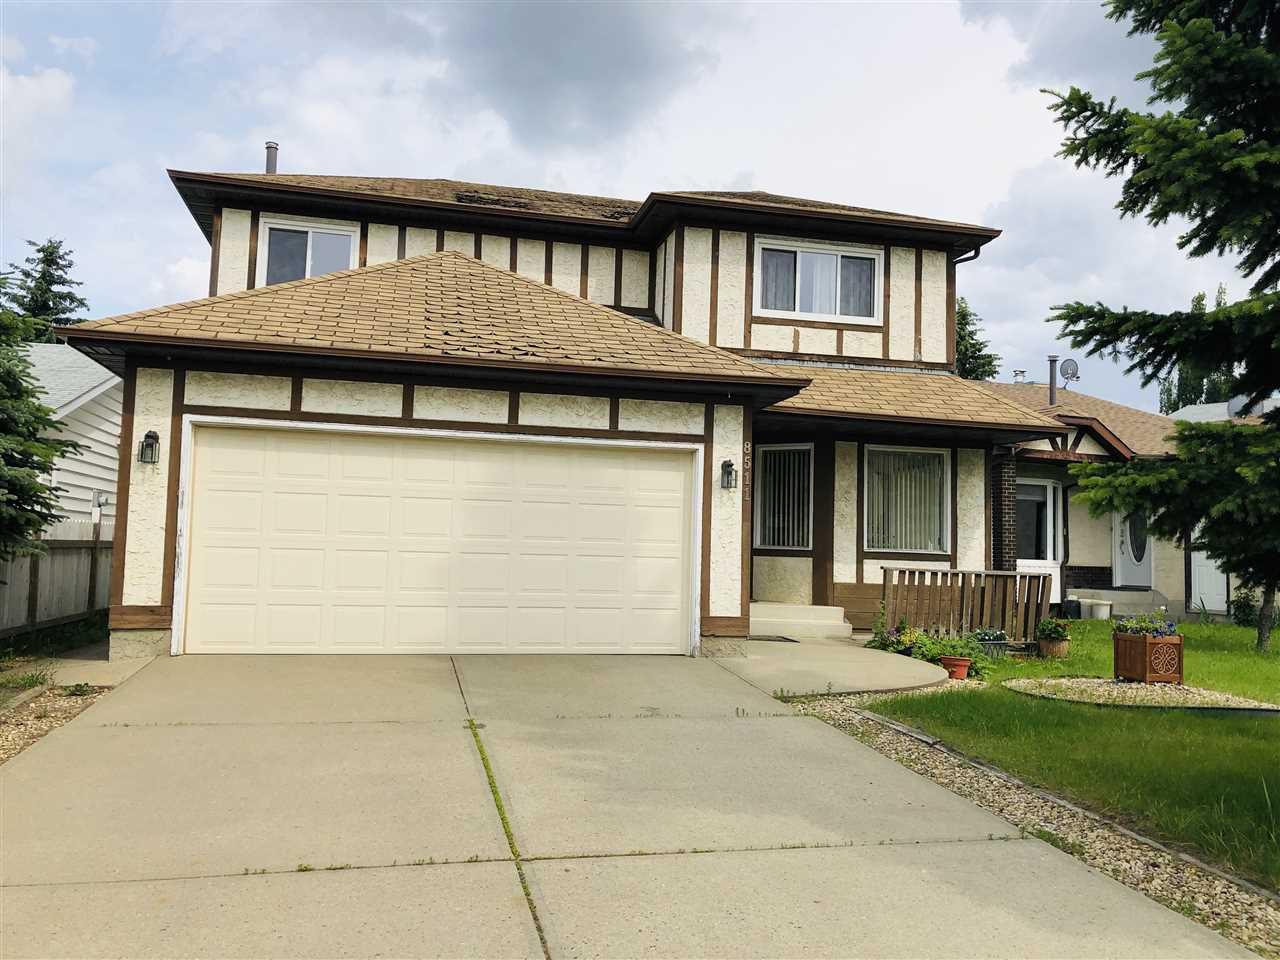 Main Photo: 8511 189 Street in Edmonton: Zone 20 House for sale : MLS®# E4164057